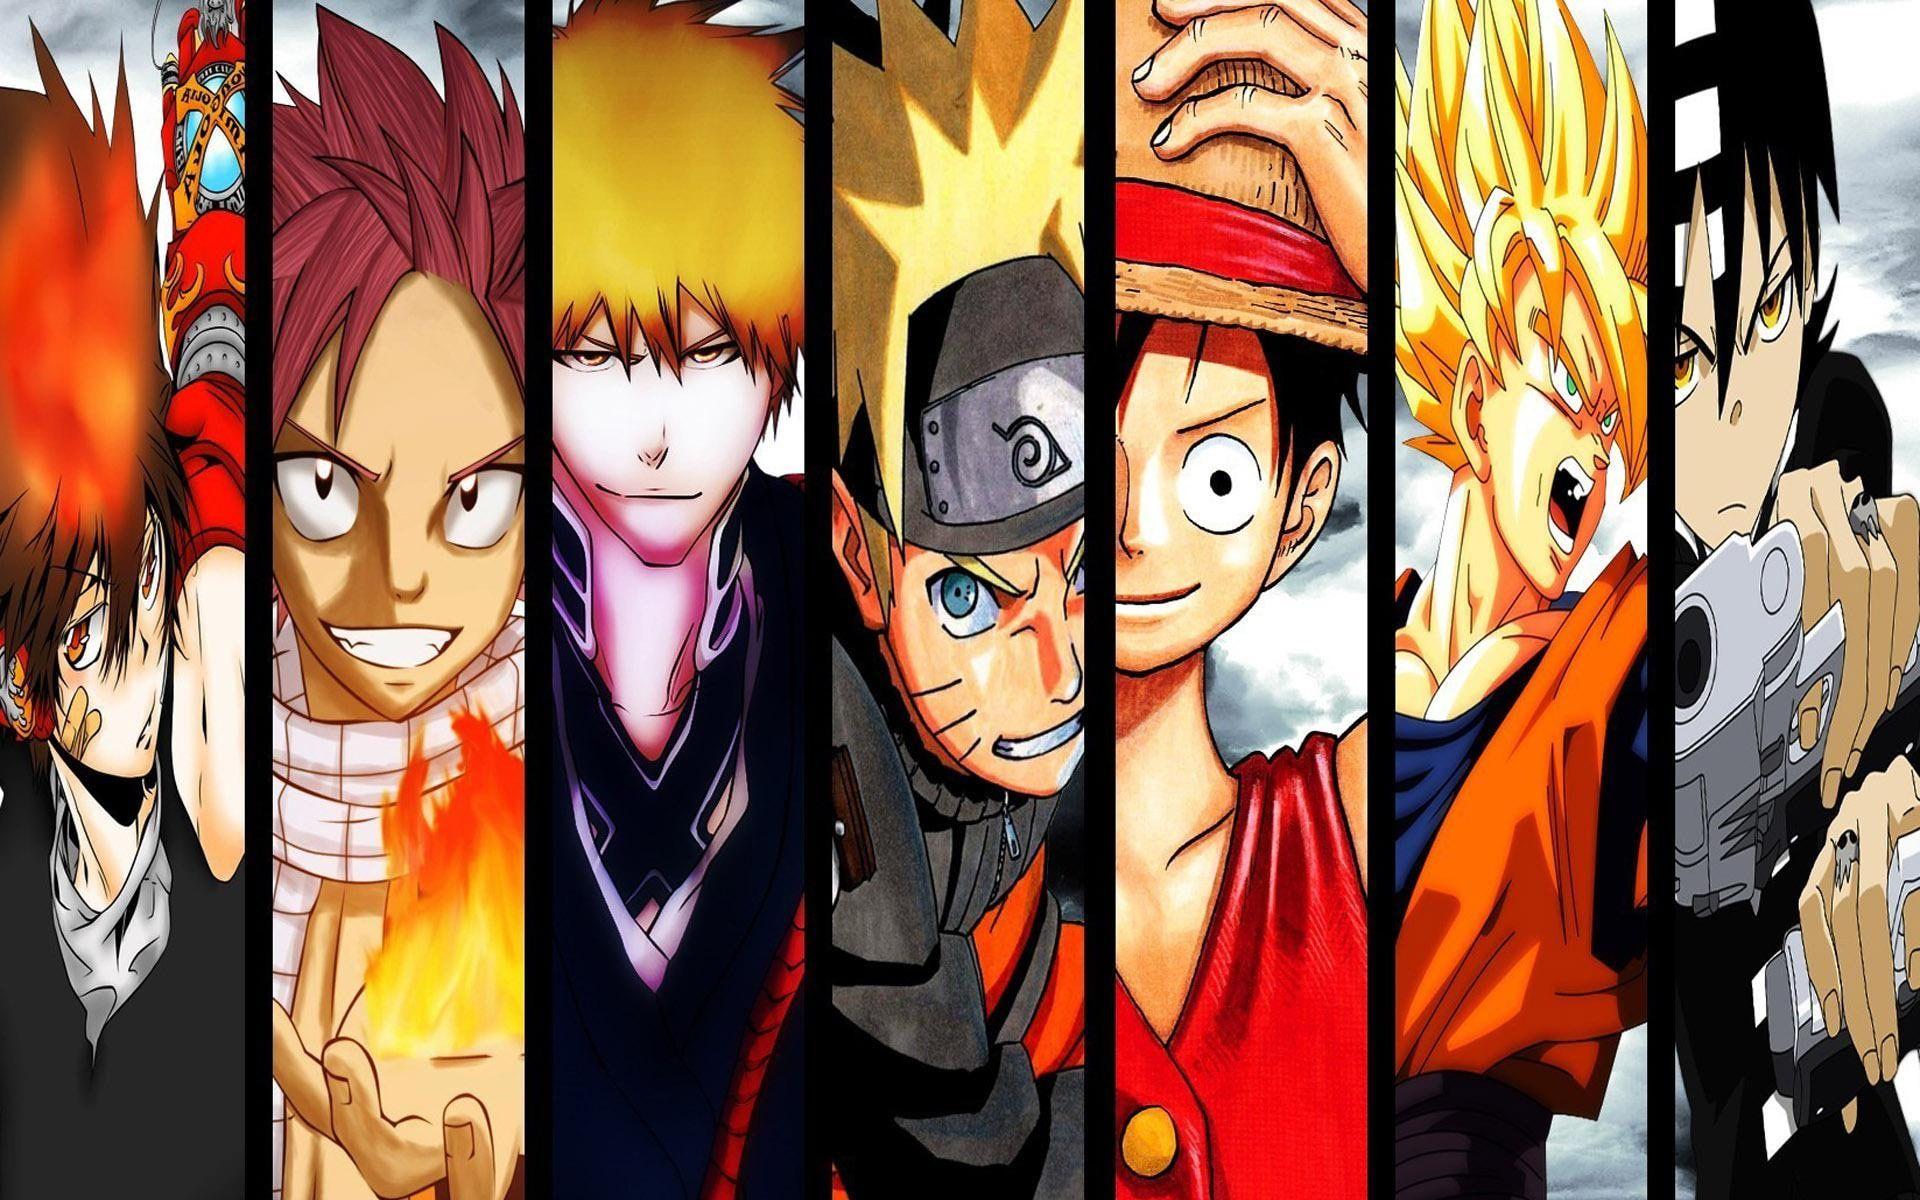 Anime Protagonists Anime Character Anime 1920x1200 Bleach One Piece Soul Eater Naruto Naruto Uzumaki Fairy Tail Dr Anime Wallpaper Anime Good Anime Series